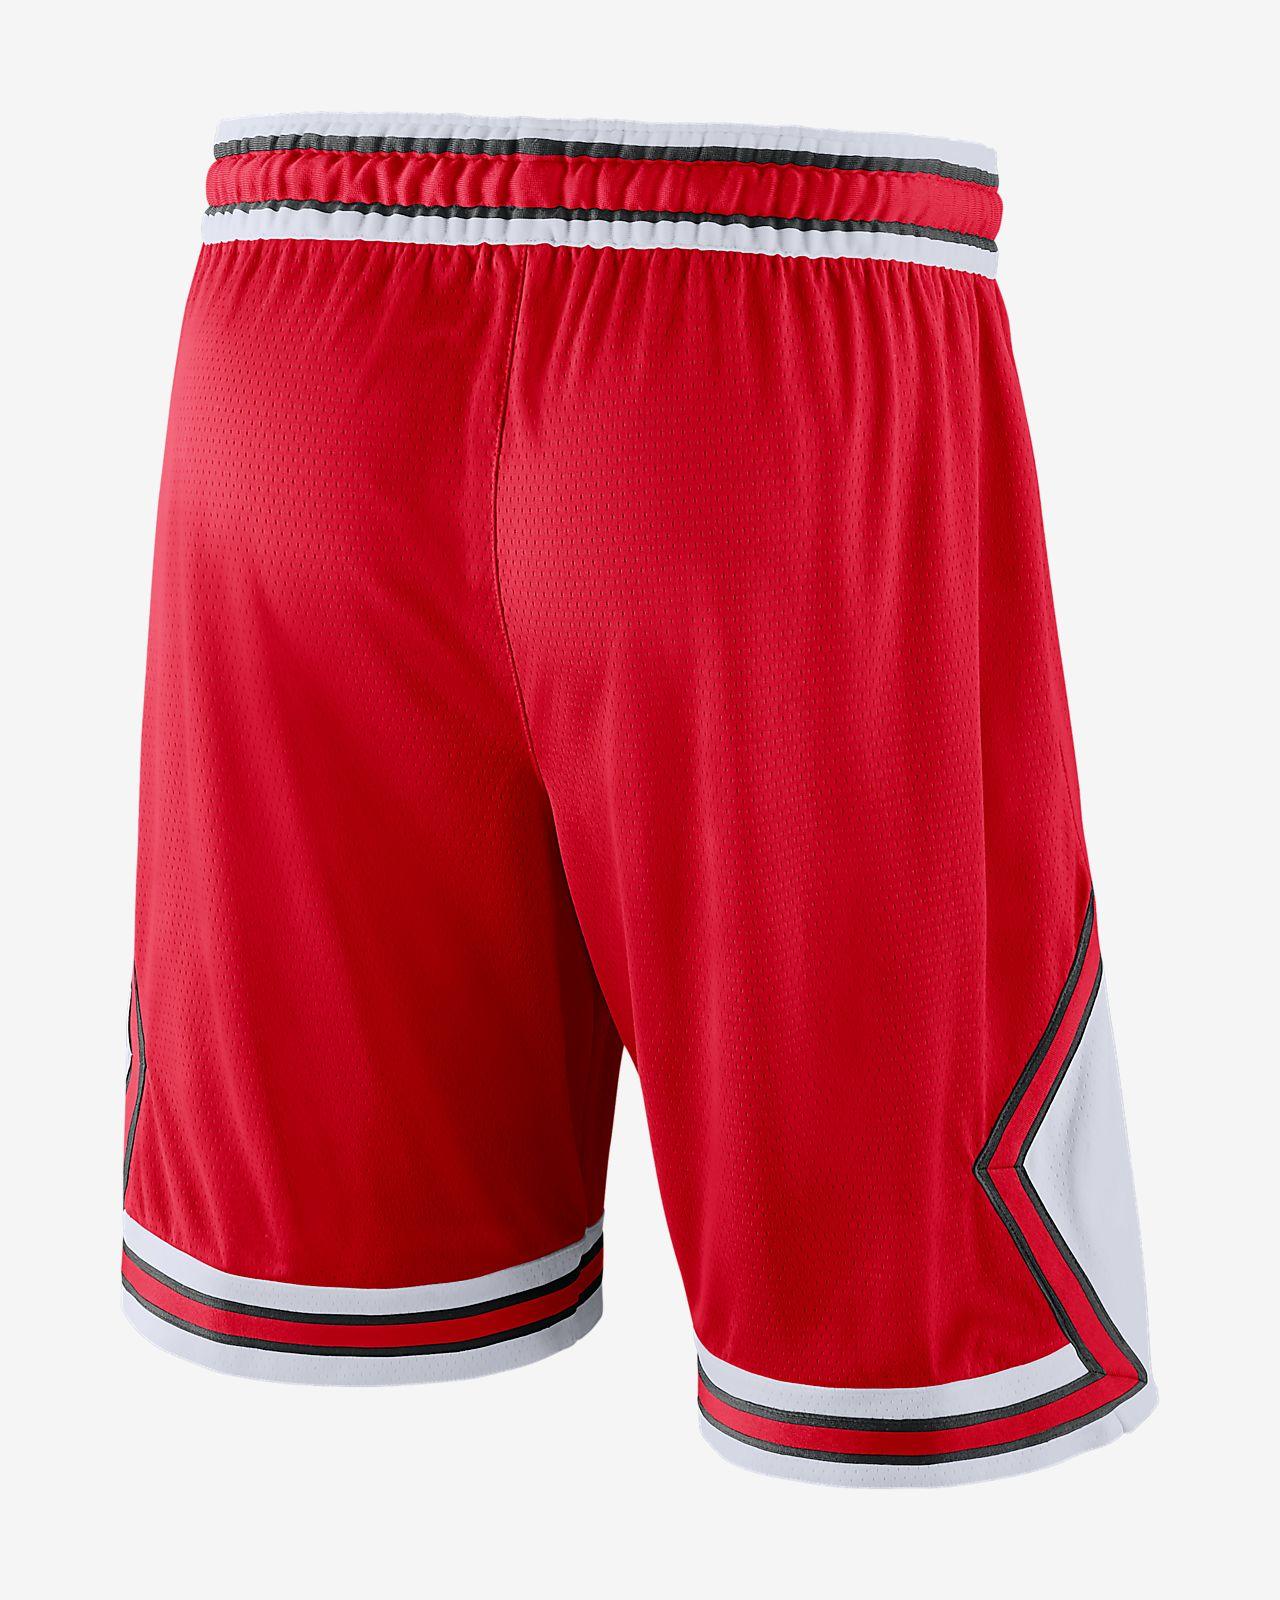 ... Shorts Nike de la NBA para hombre Chicago Bulls Icon Edition Swingman 3247ce8d3b6